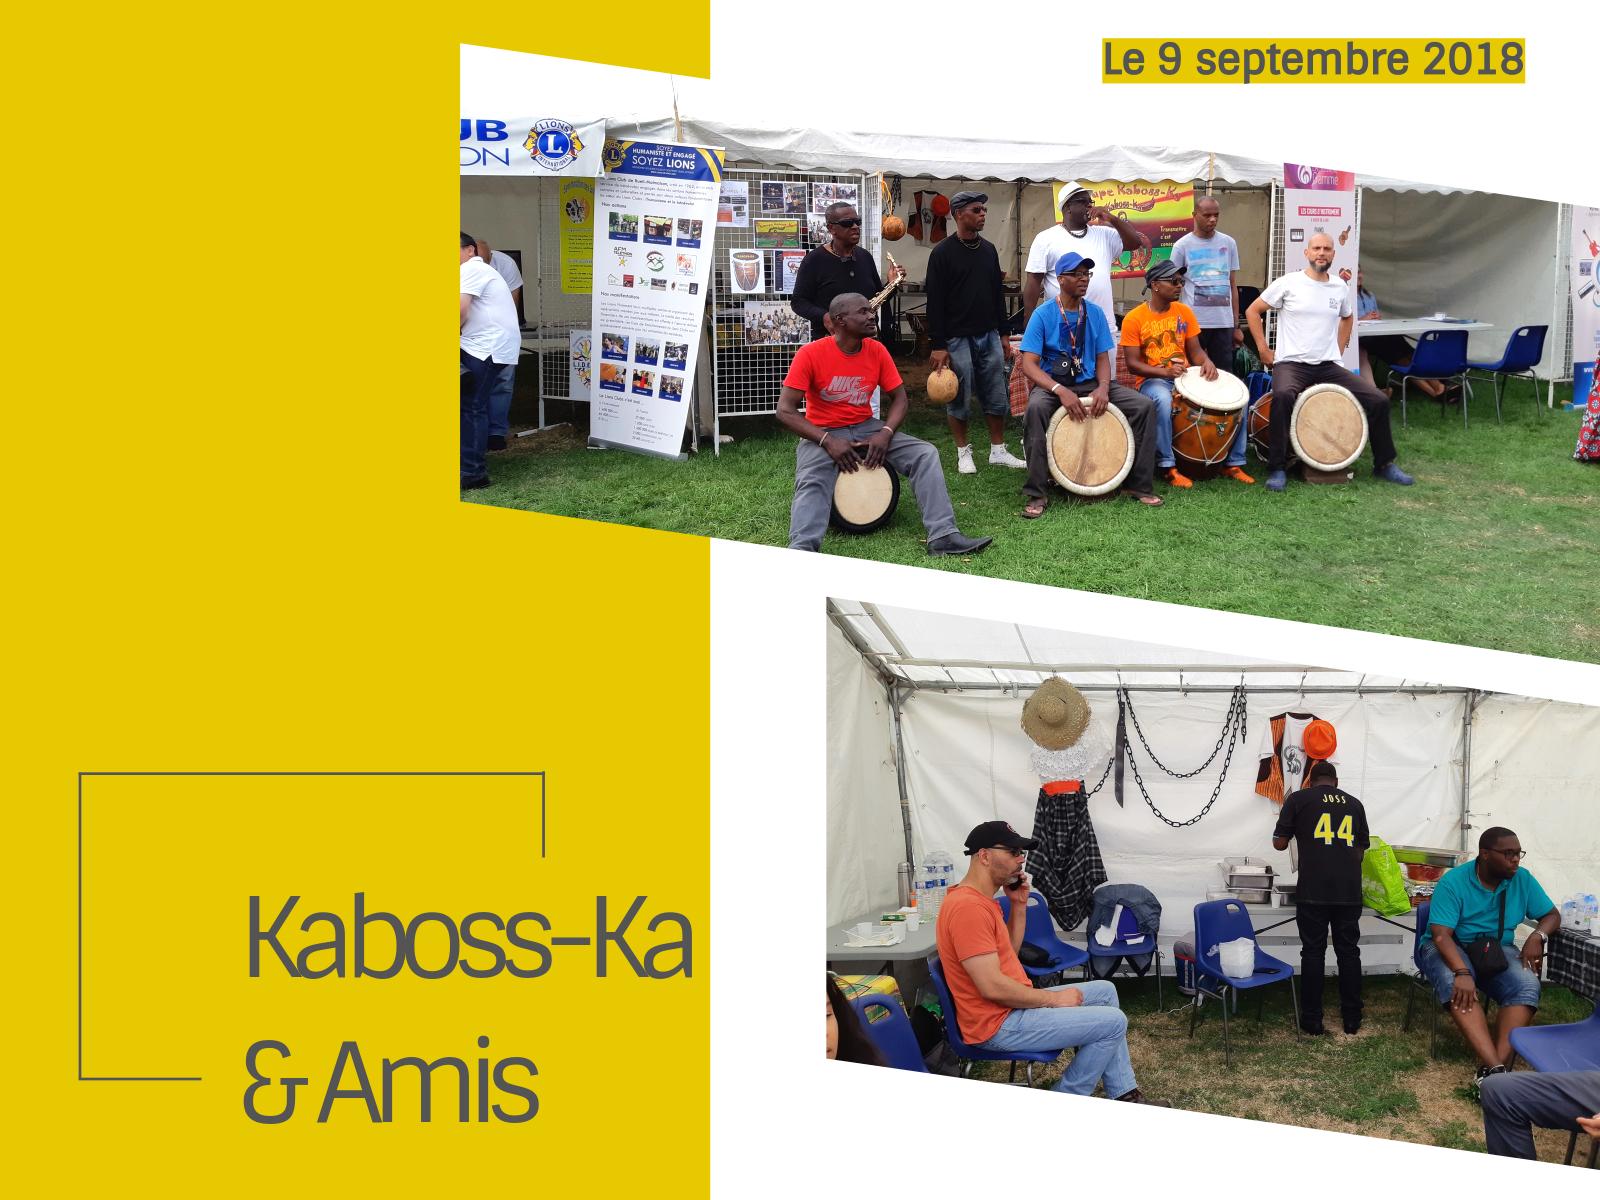 KABOSS-KA et AMIS